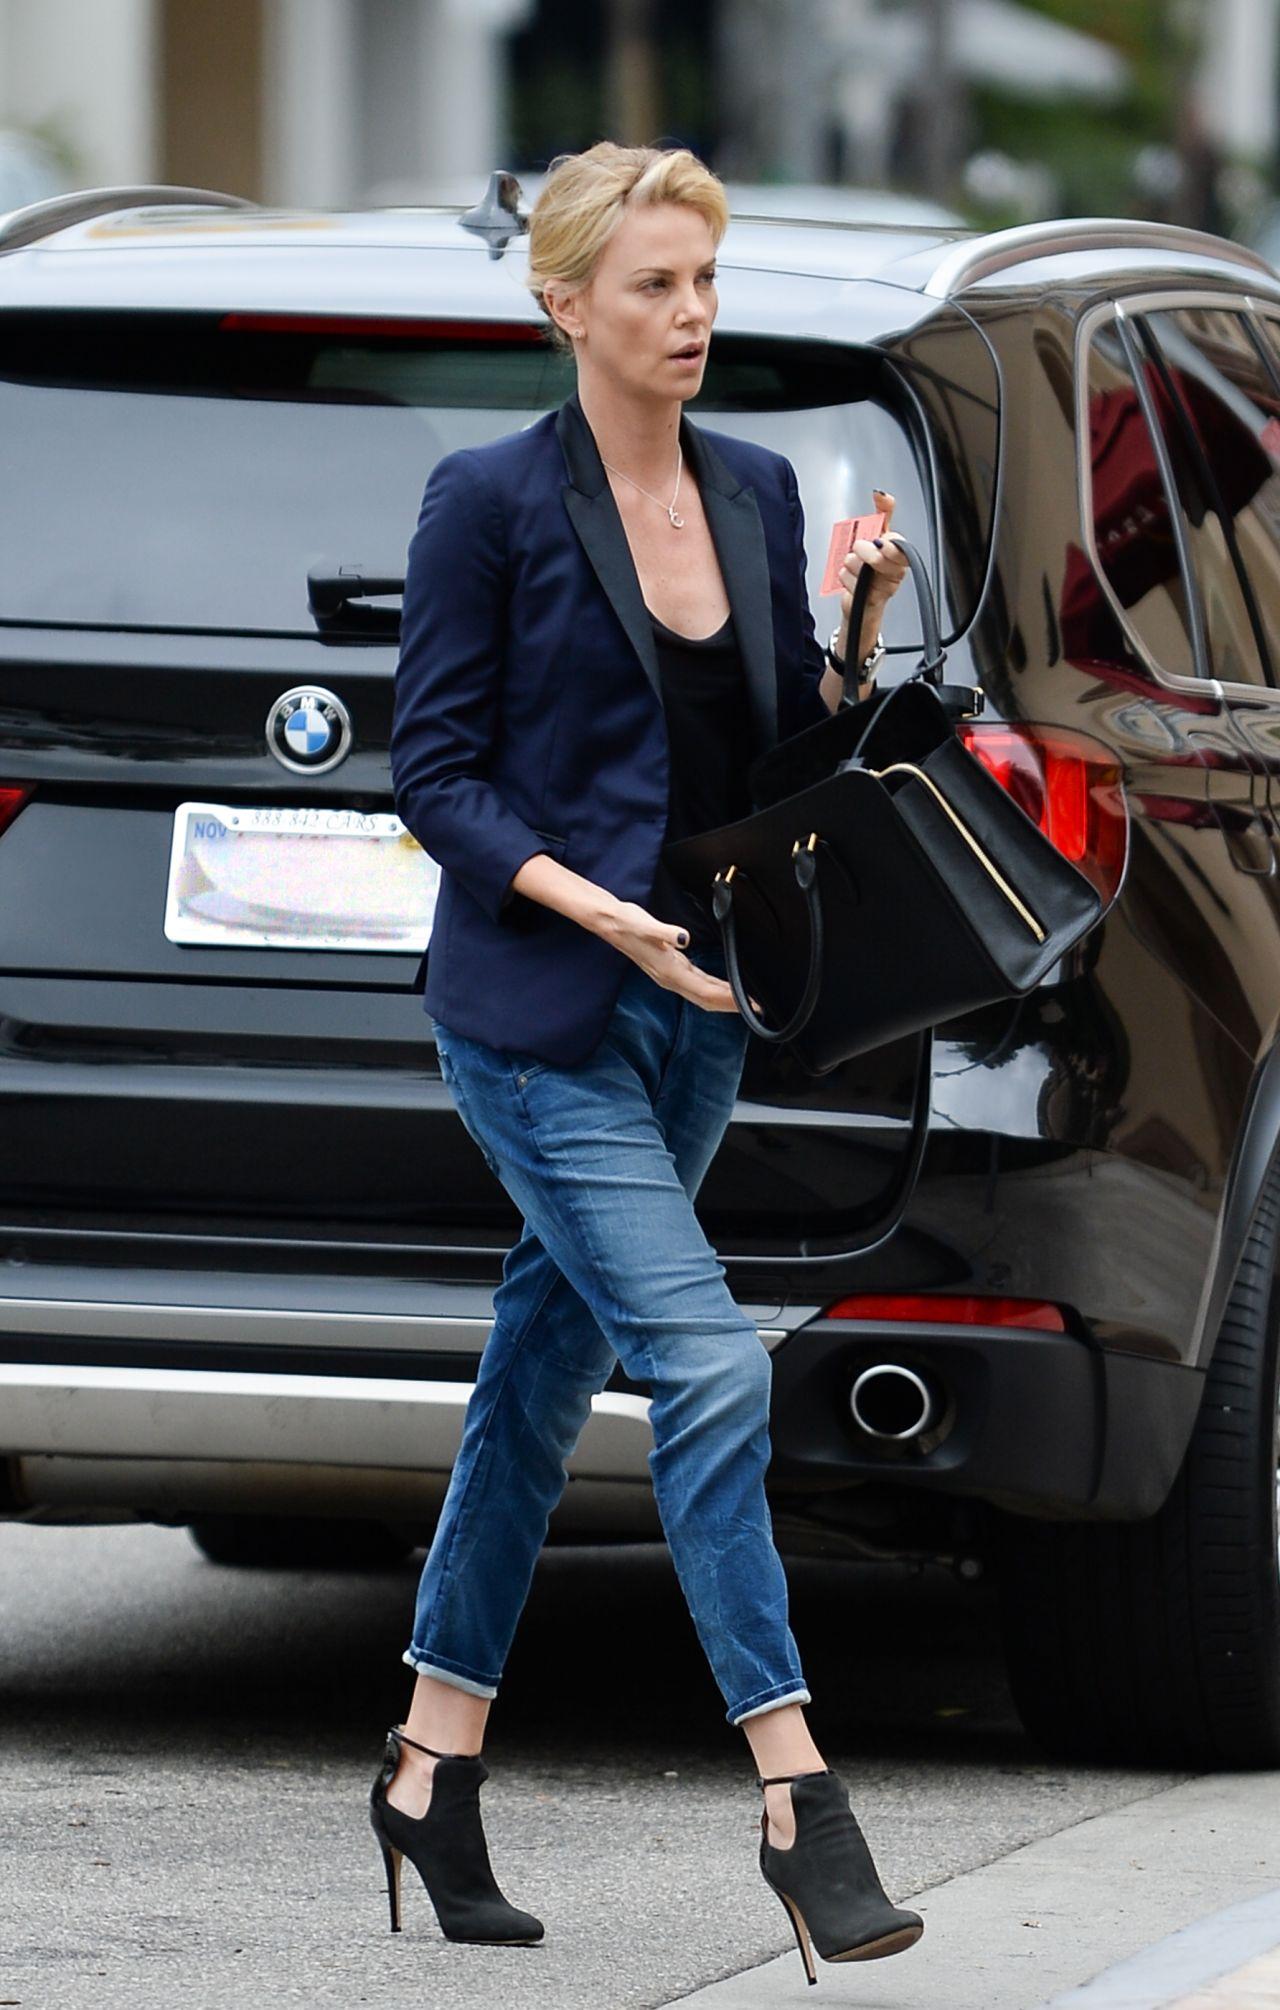 Candid street jeans 2 probably sophie turner - 4 1